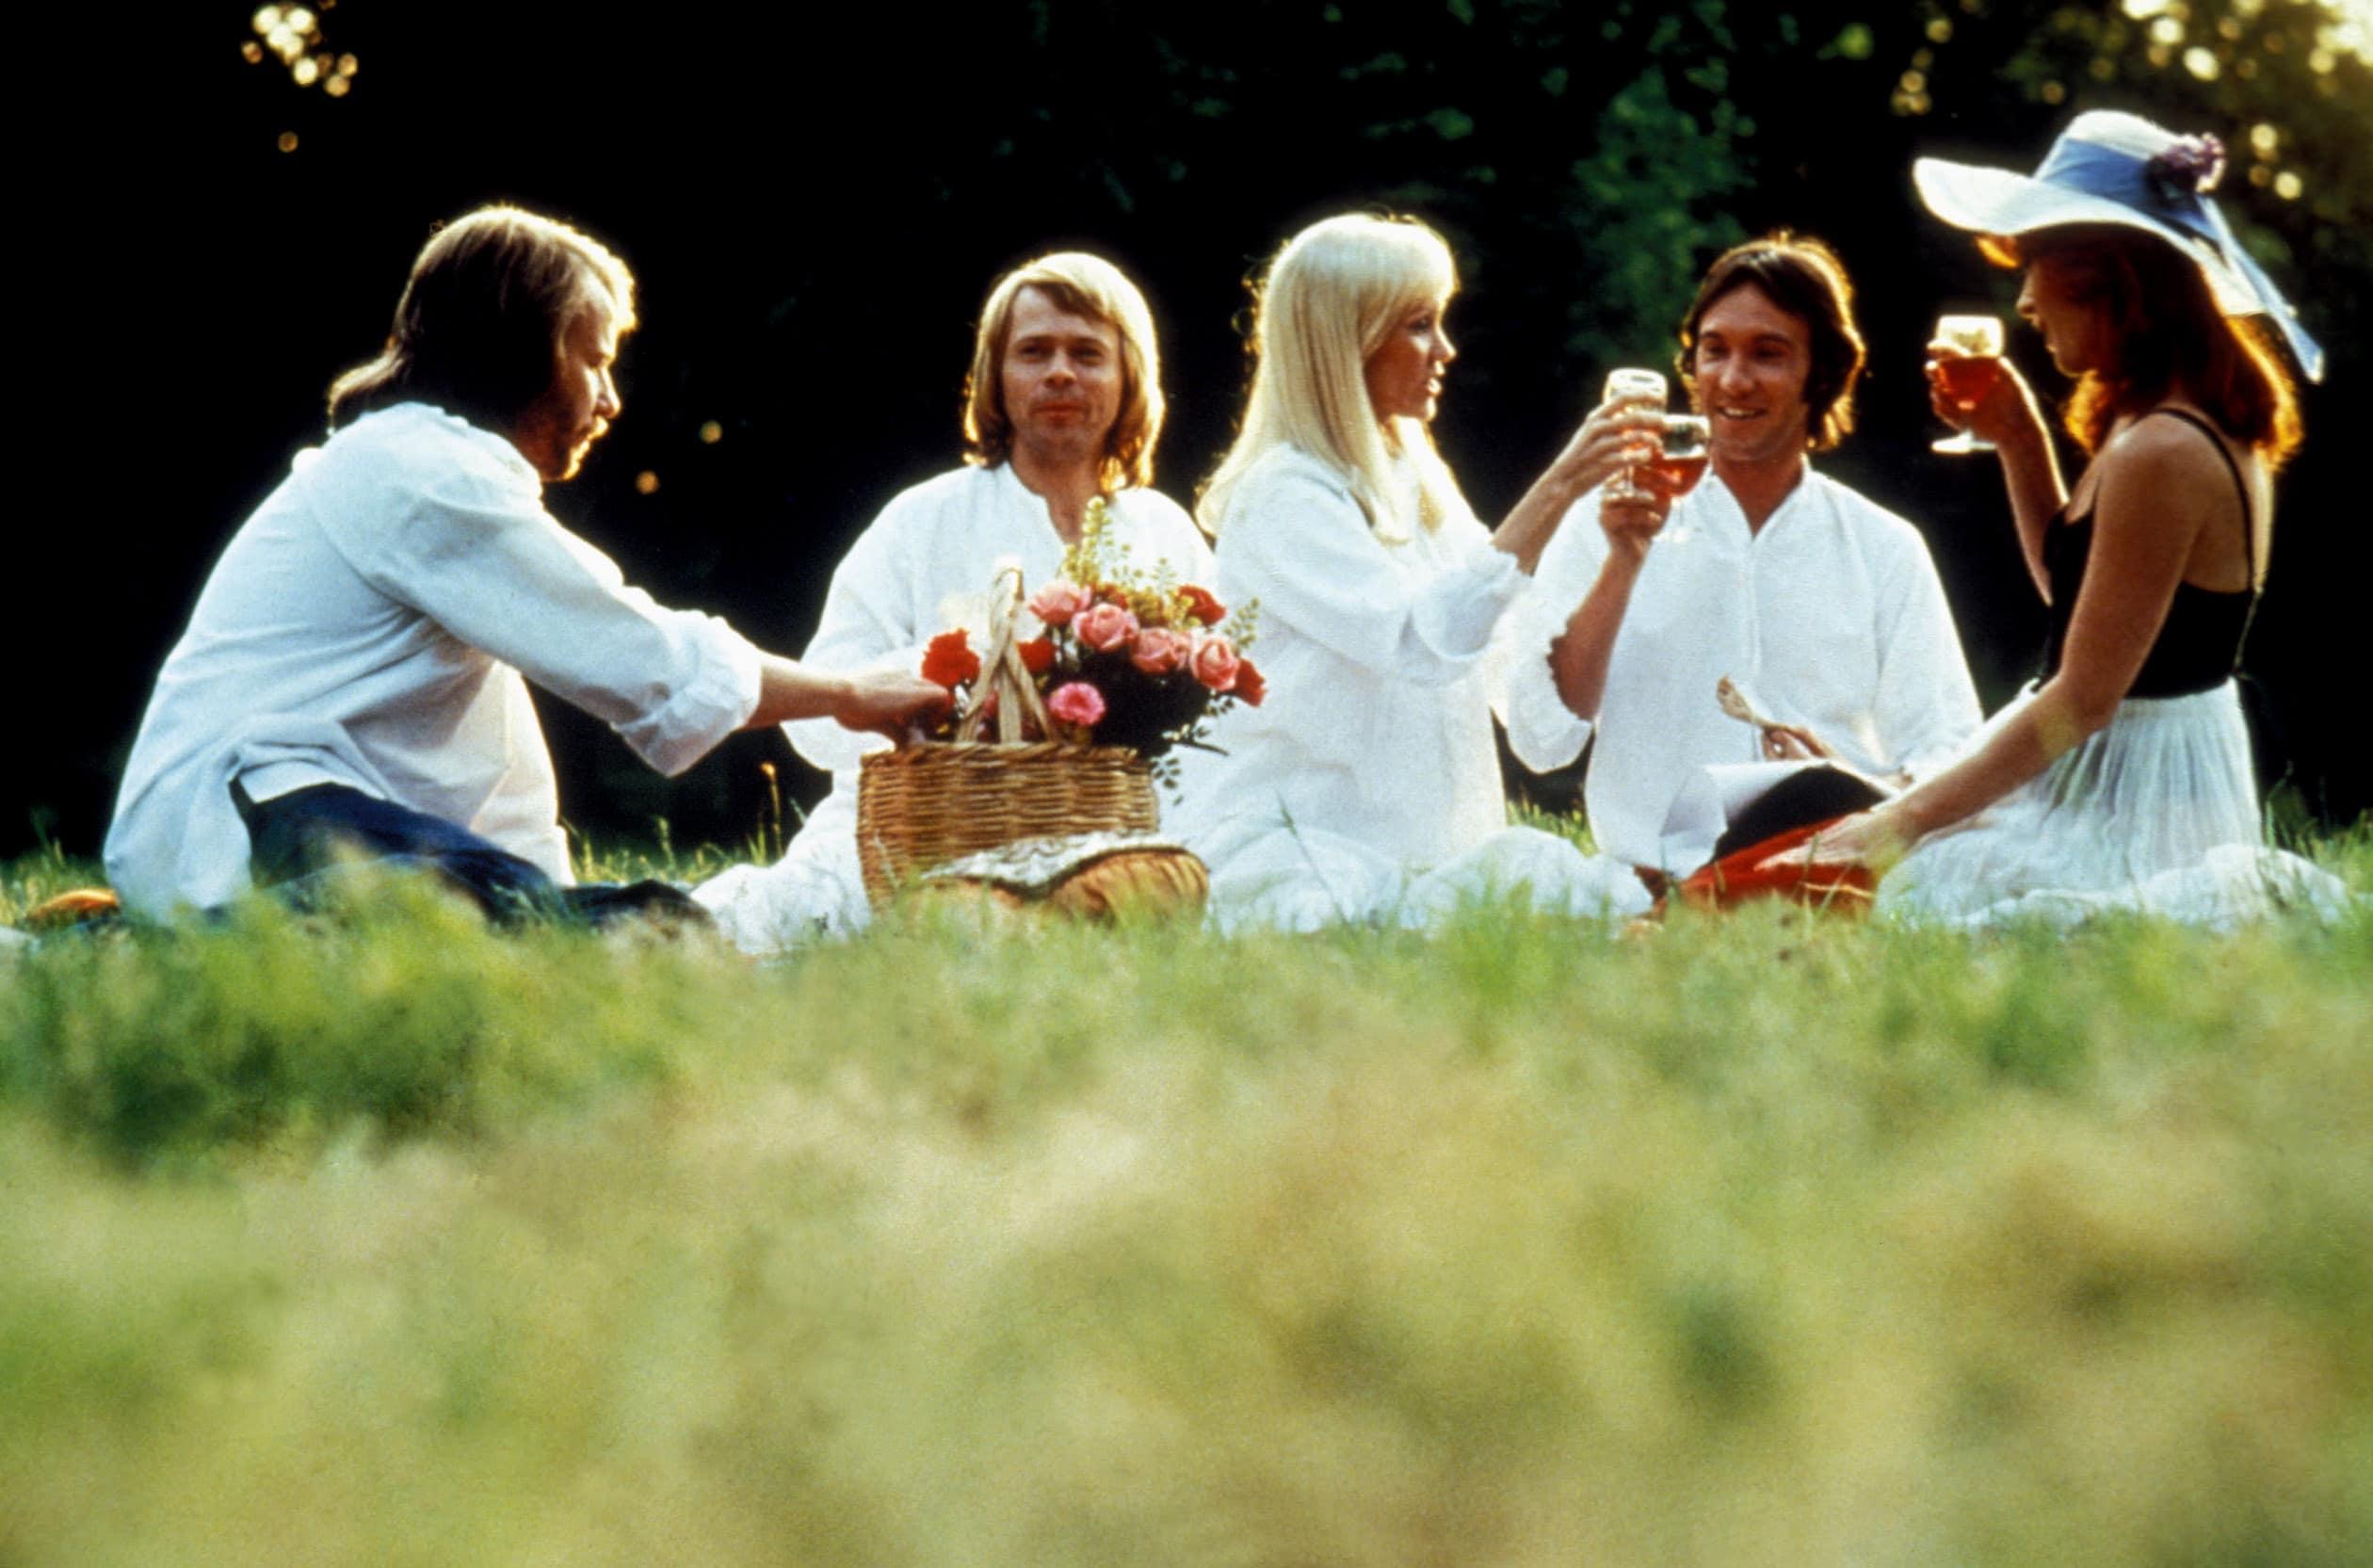 ABBA: THE MOVIE, Benny Andersson, Bjorn Ulvaeus, Agnetha Faltskog, Robert Hughes, Anni-Frid Lyngstad, 1977